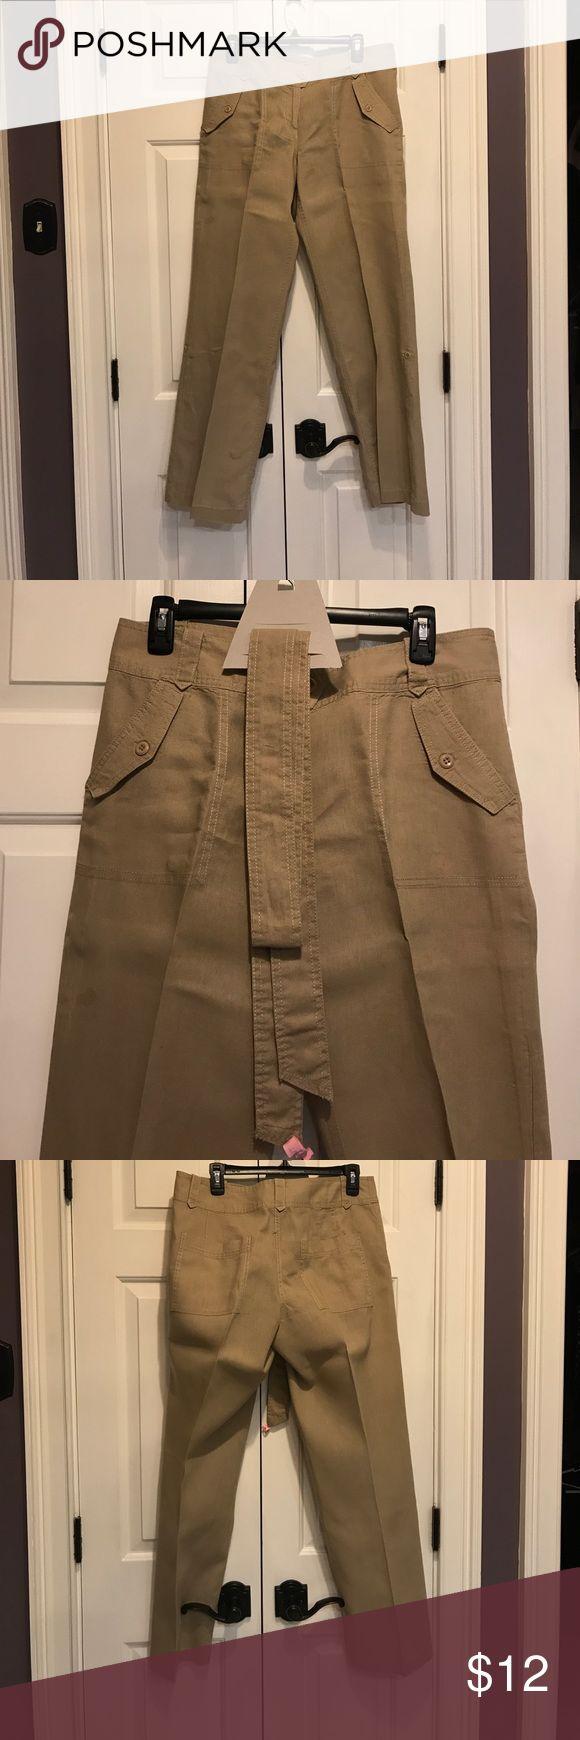 Willi Smith Dress linen pants - tie belt Willi Smith Dress linen pants - tie belt Willi Smith Pants Trousers